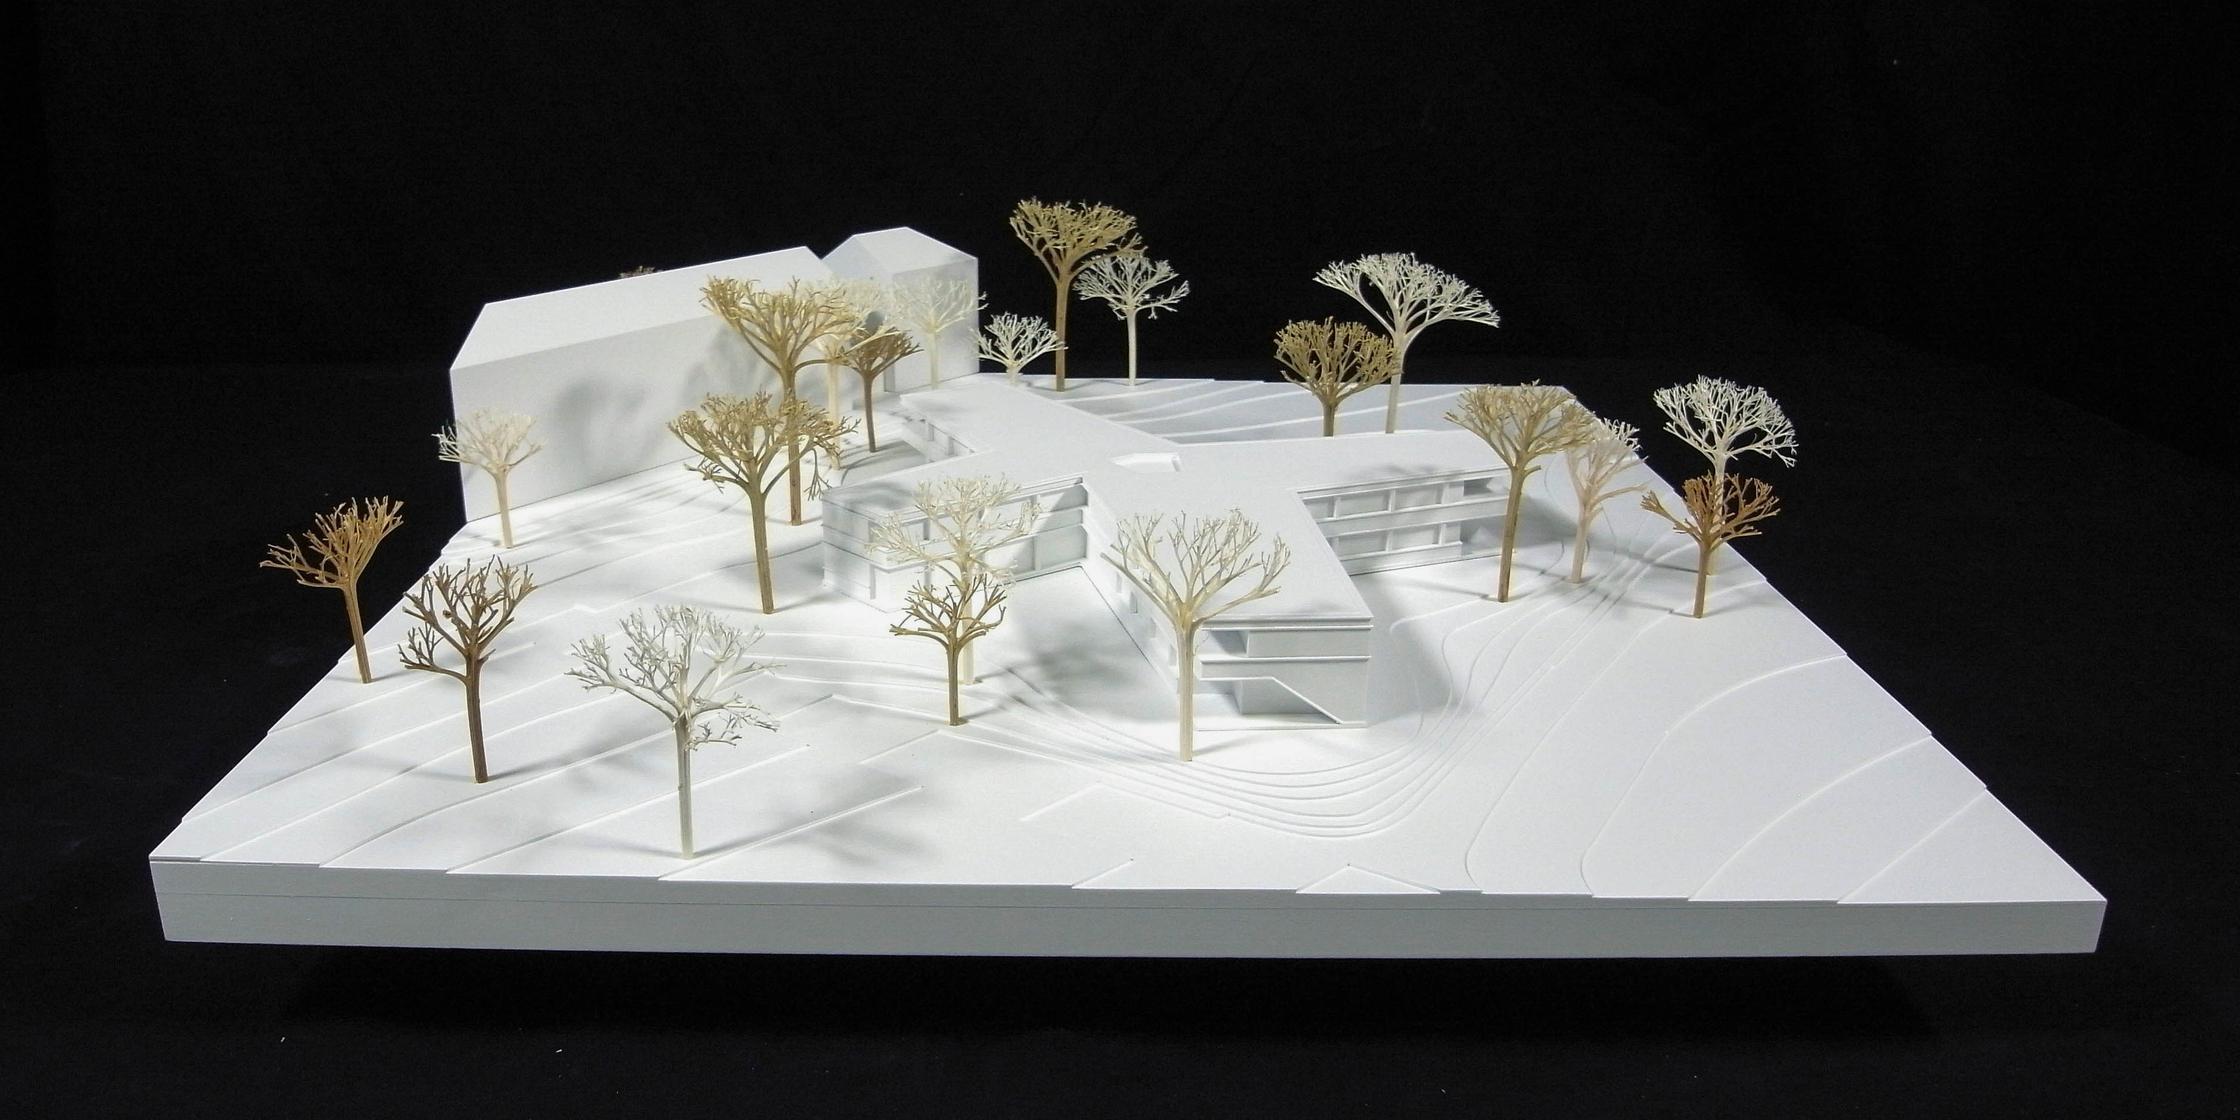 Ffm-Sossenheim Kinderhaus Frank Modell